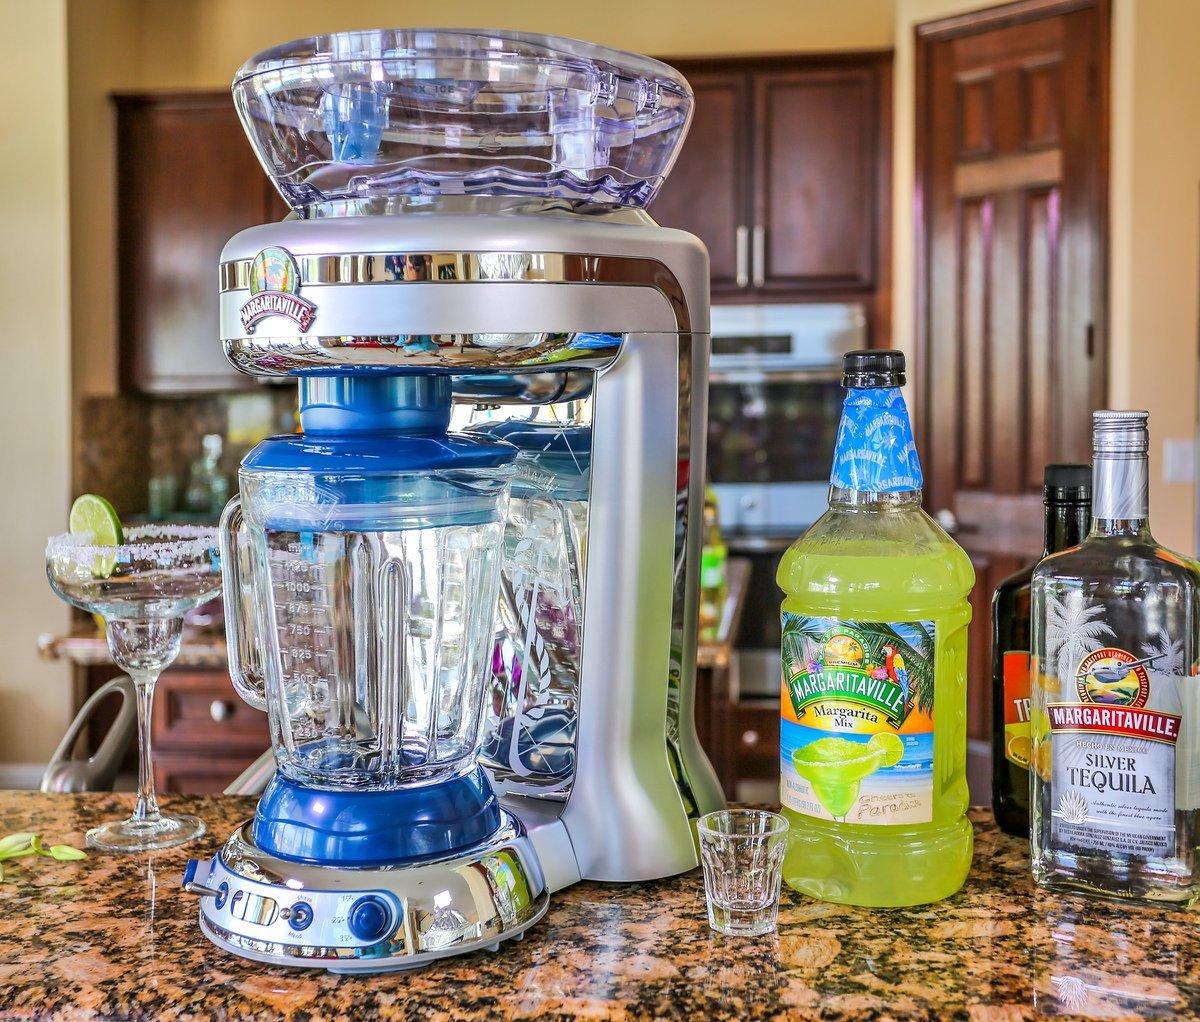 Margaritaville Key West Frozen Concoction Maker with Easy Pour Jar and XL Ice Reservoir, DM1900 by Margaritaville (Image #5)